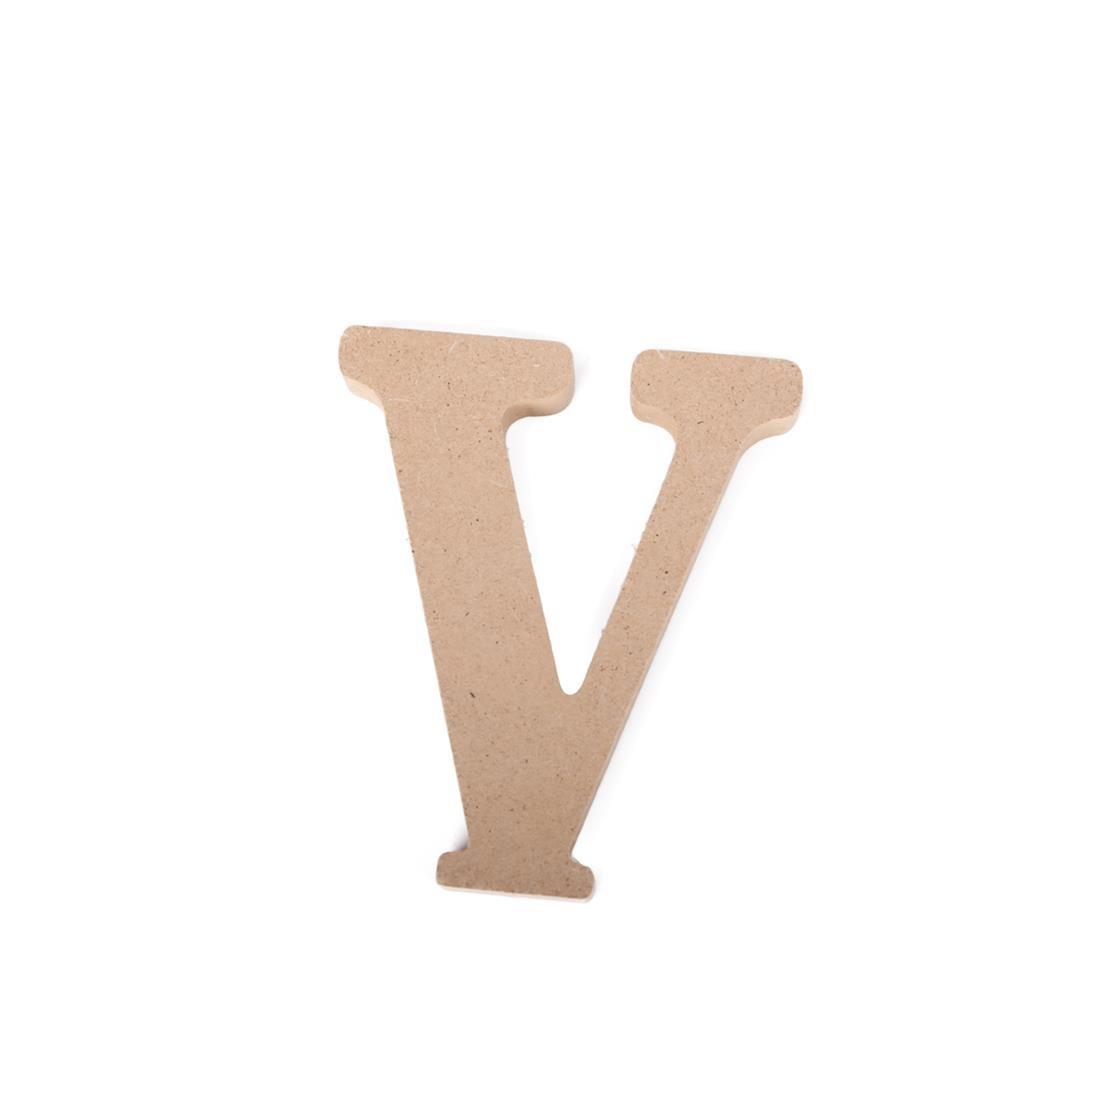 FUT Forever 26 - V Larege A - Z木製アルファベット装飾工芸文字Hanging壁文字装飾寝室ウェディング誕生日パーティーホーム V FUT@D300422-CN-CLS-1 Wooden V Wooden Color B07FTB33R2, 通販天国:43eb3211 --- ijpba.info